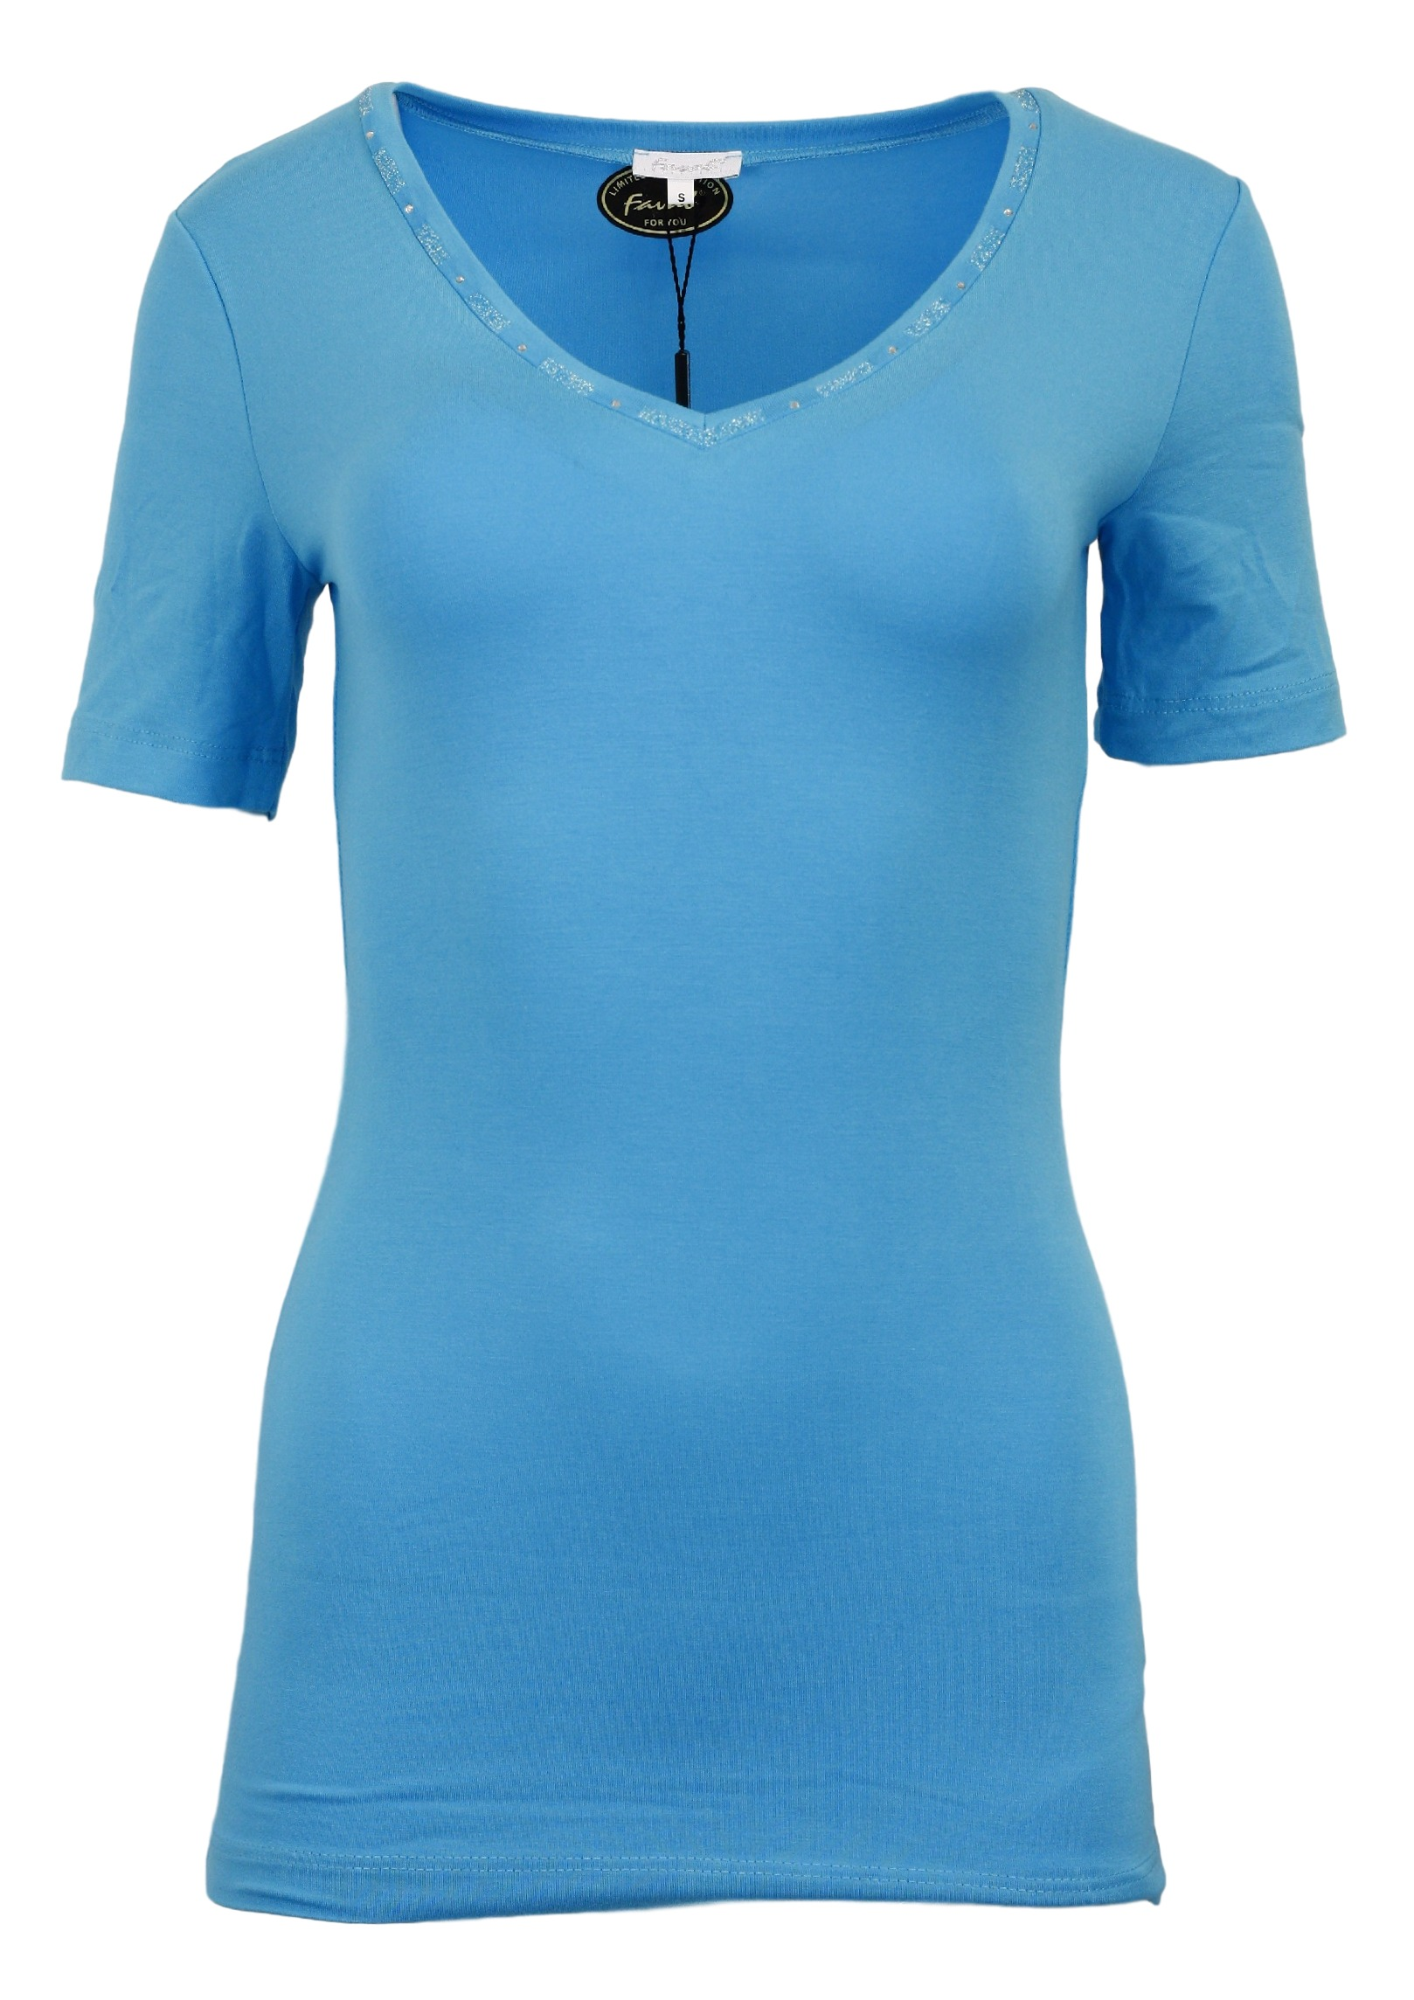 Dámské tričko Lacik KR - Favab Barva: tyrkys, Velikost: L